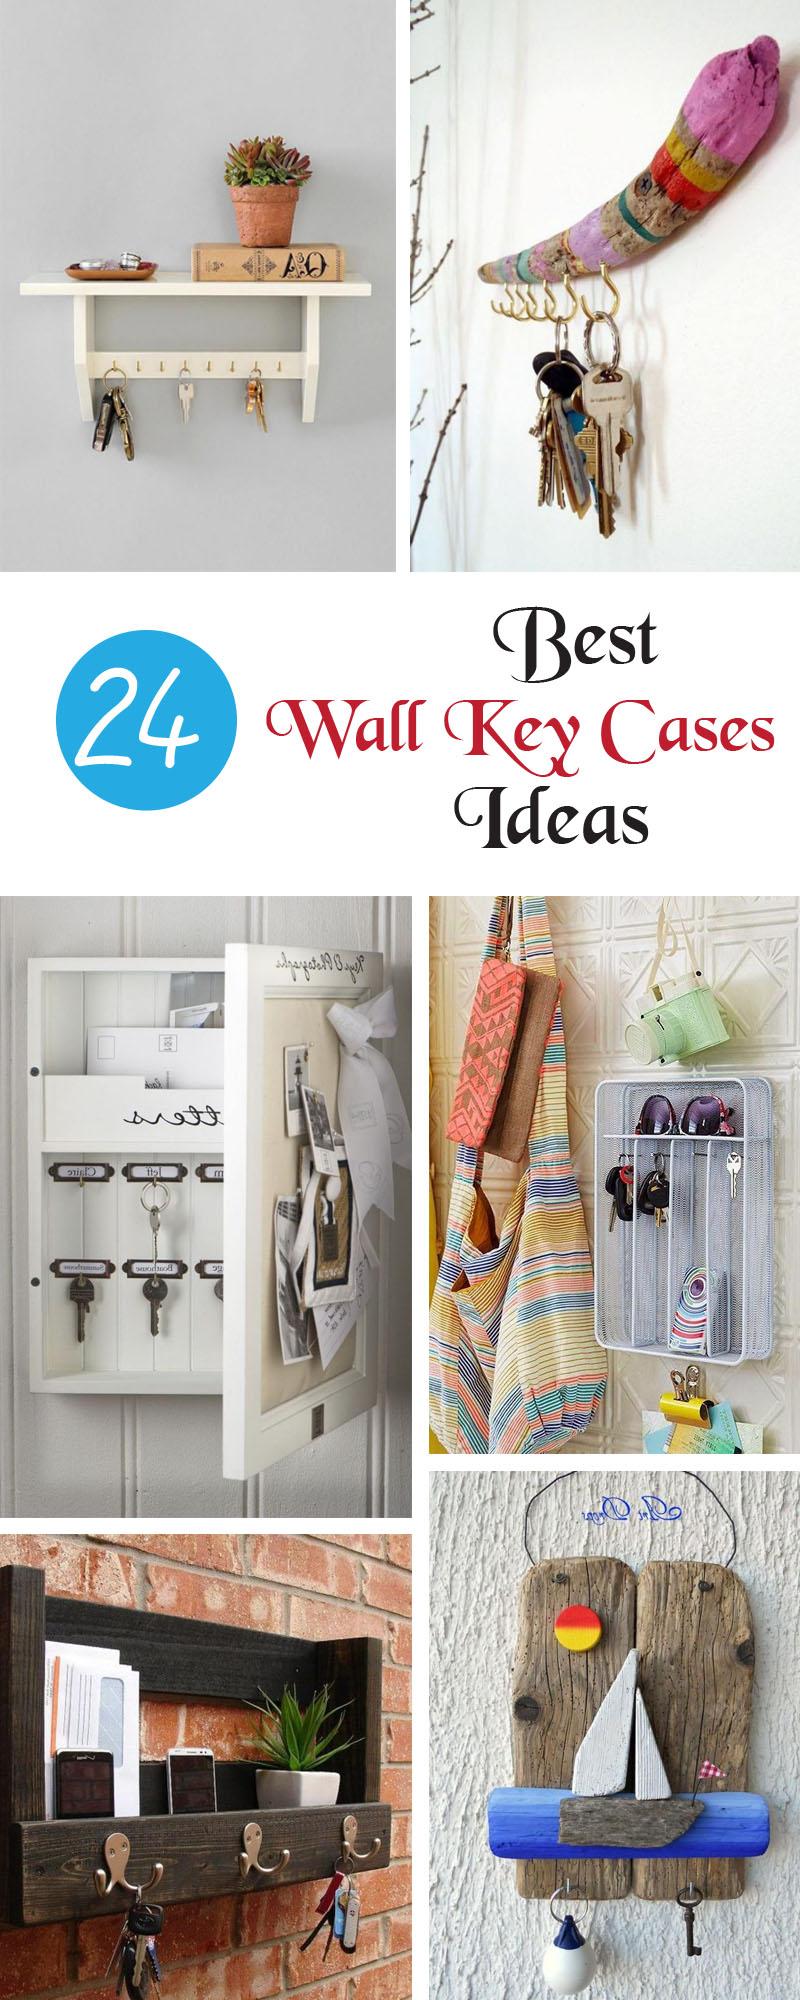 best wall key cases ideas